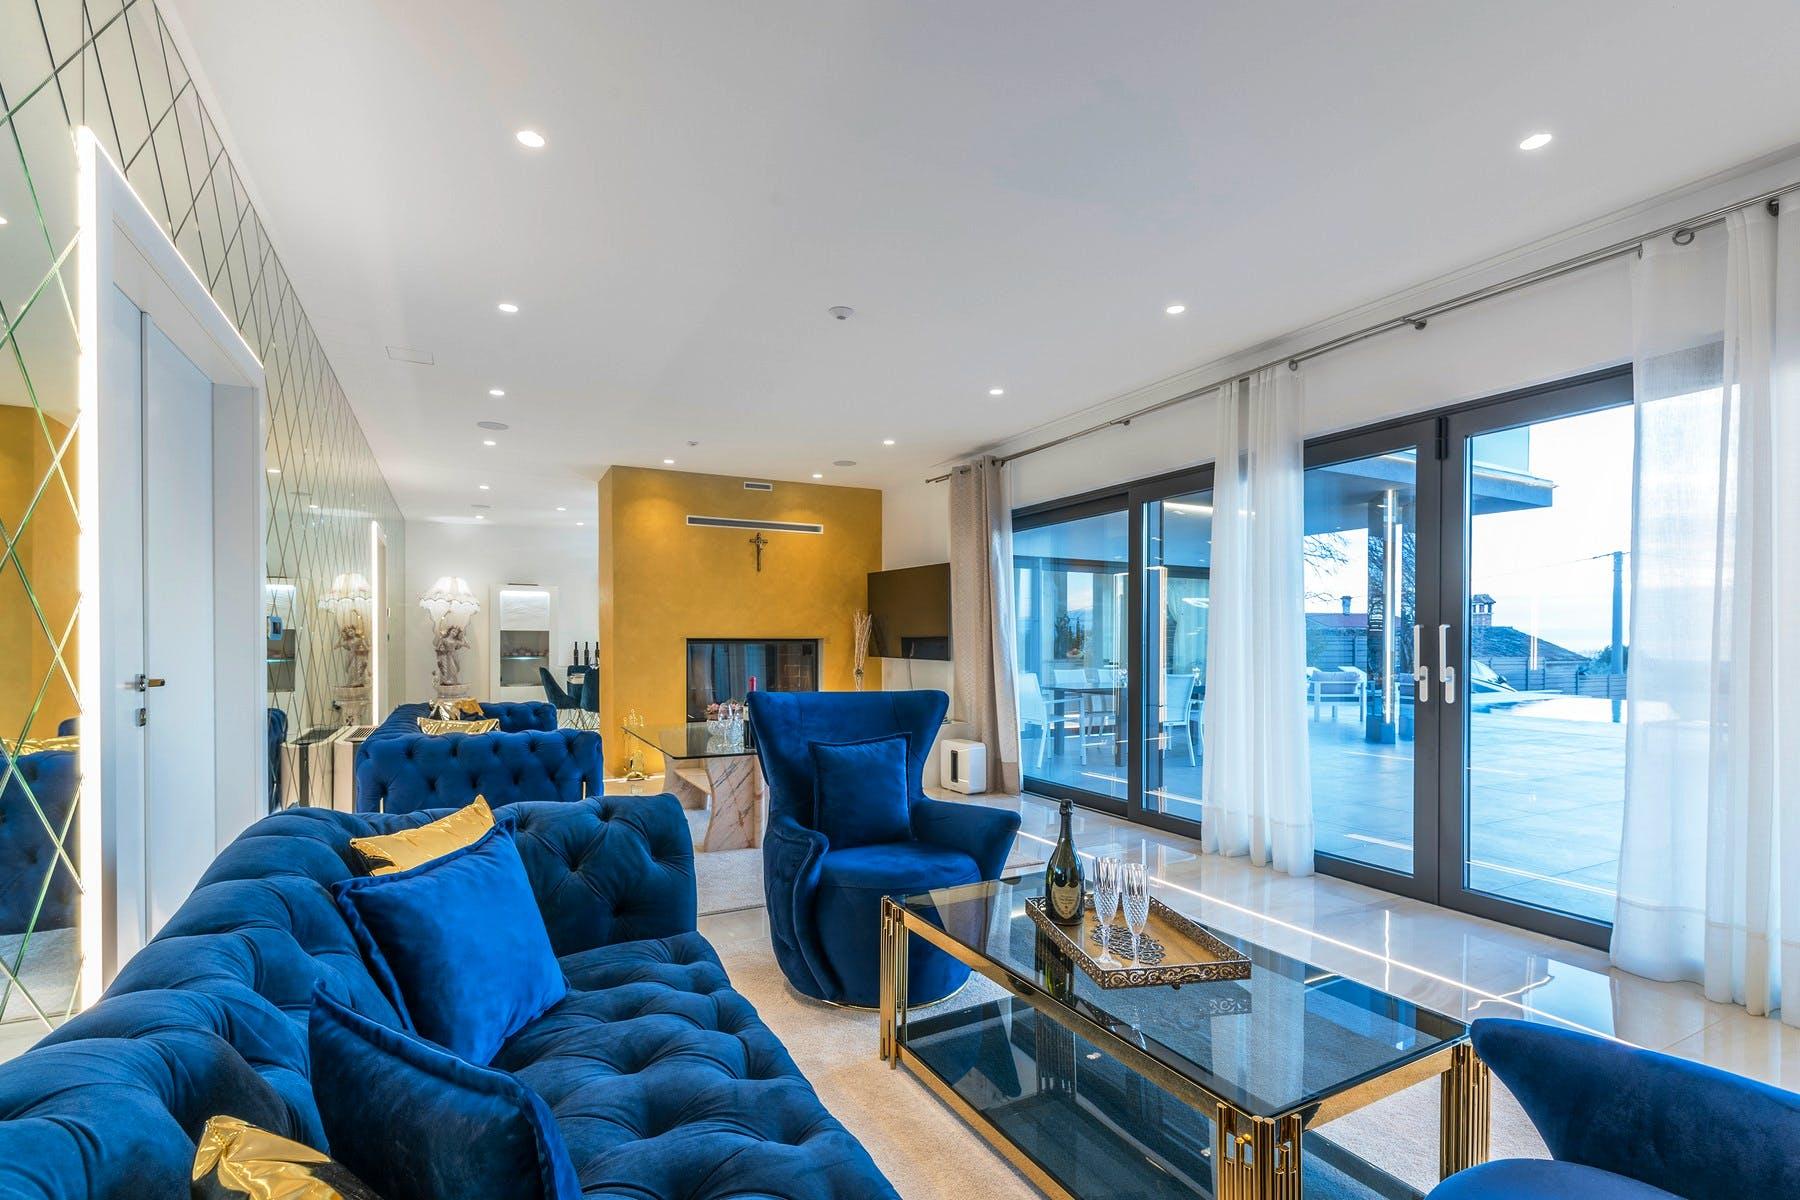 Elegant and modern interior design